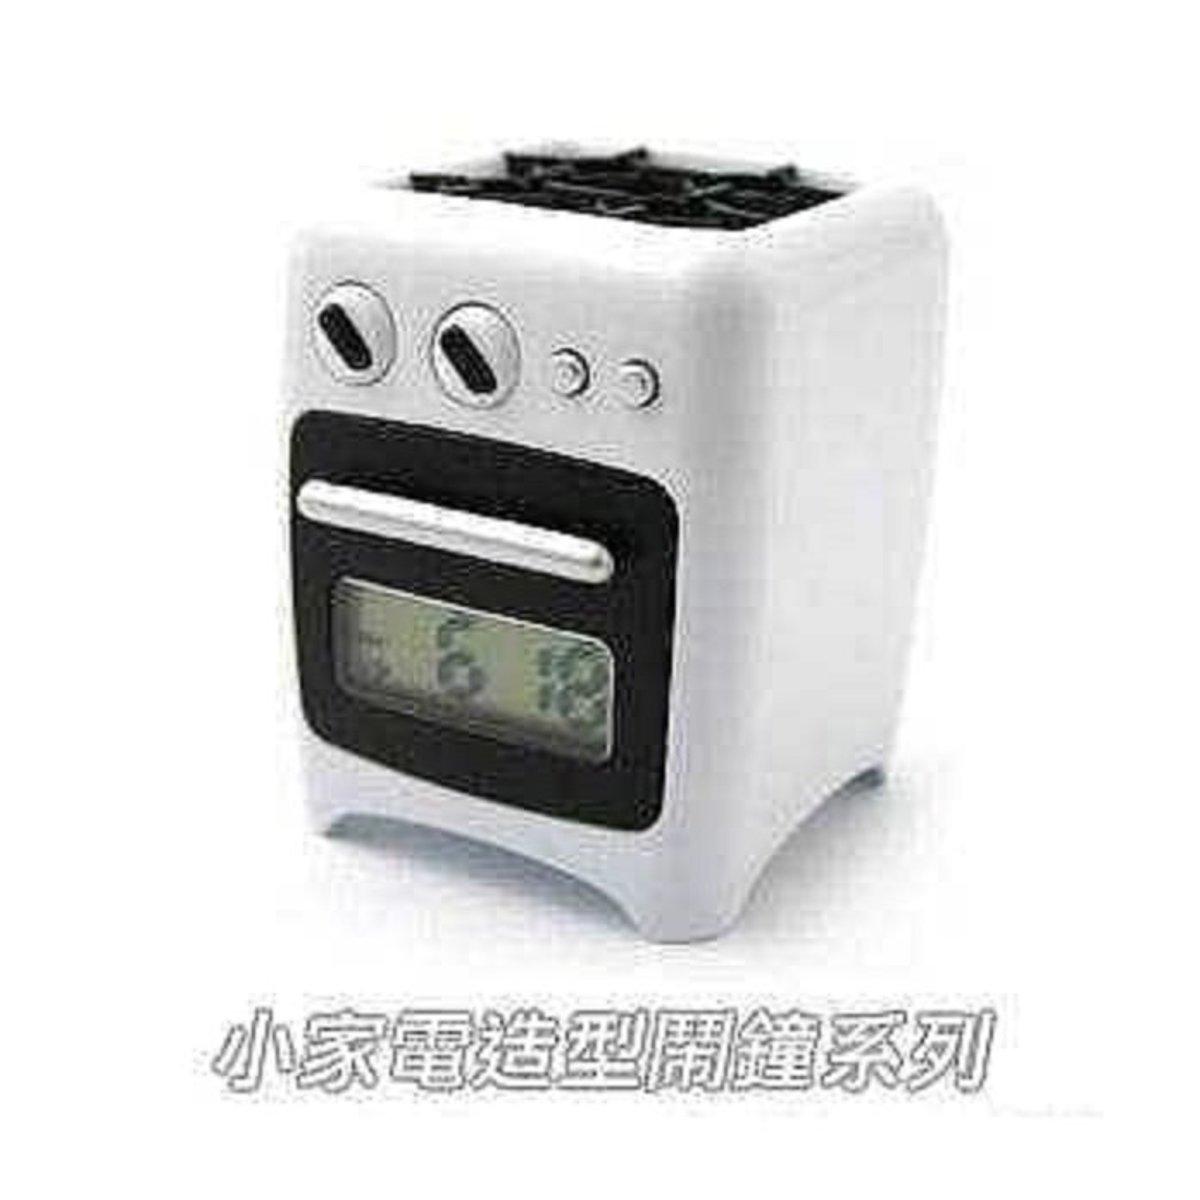 Oven Alarm Clock-White